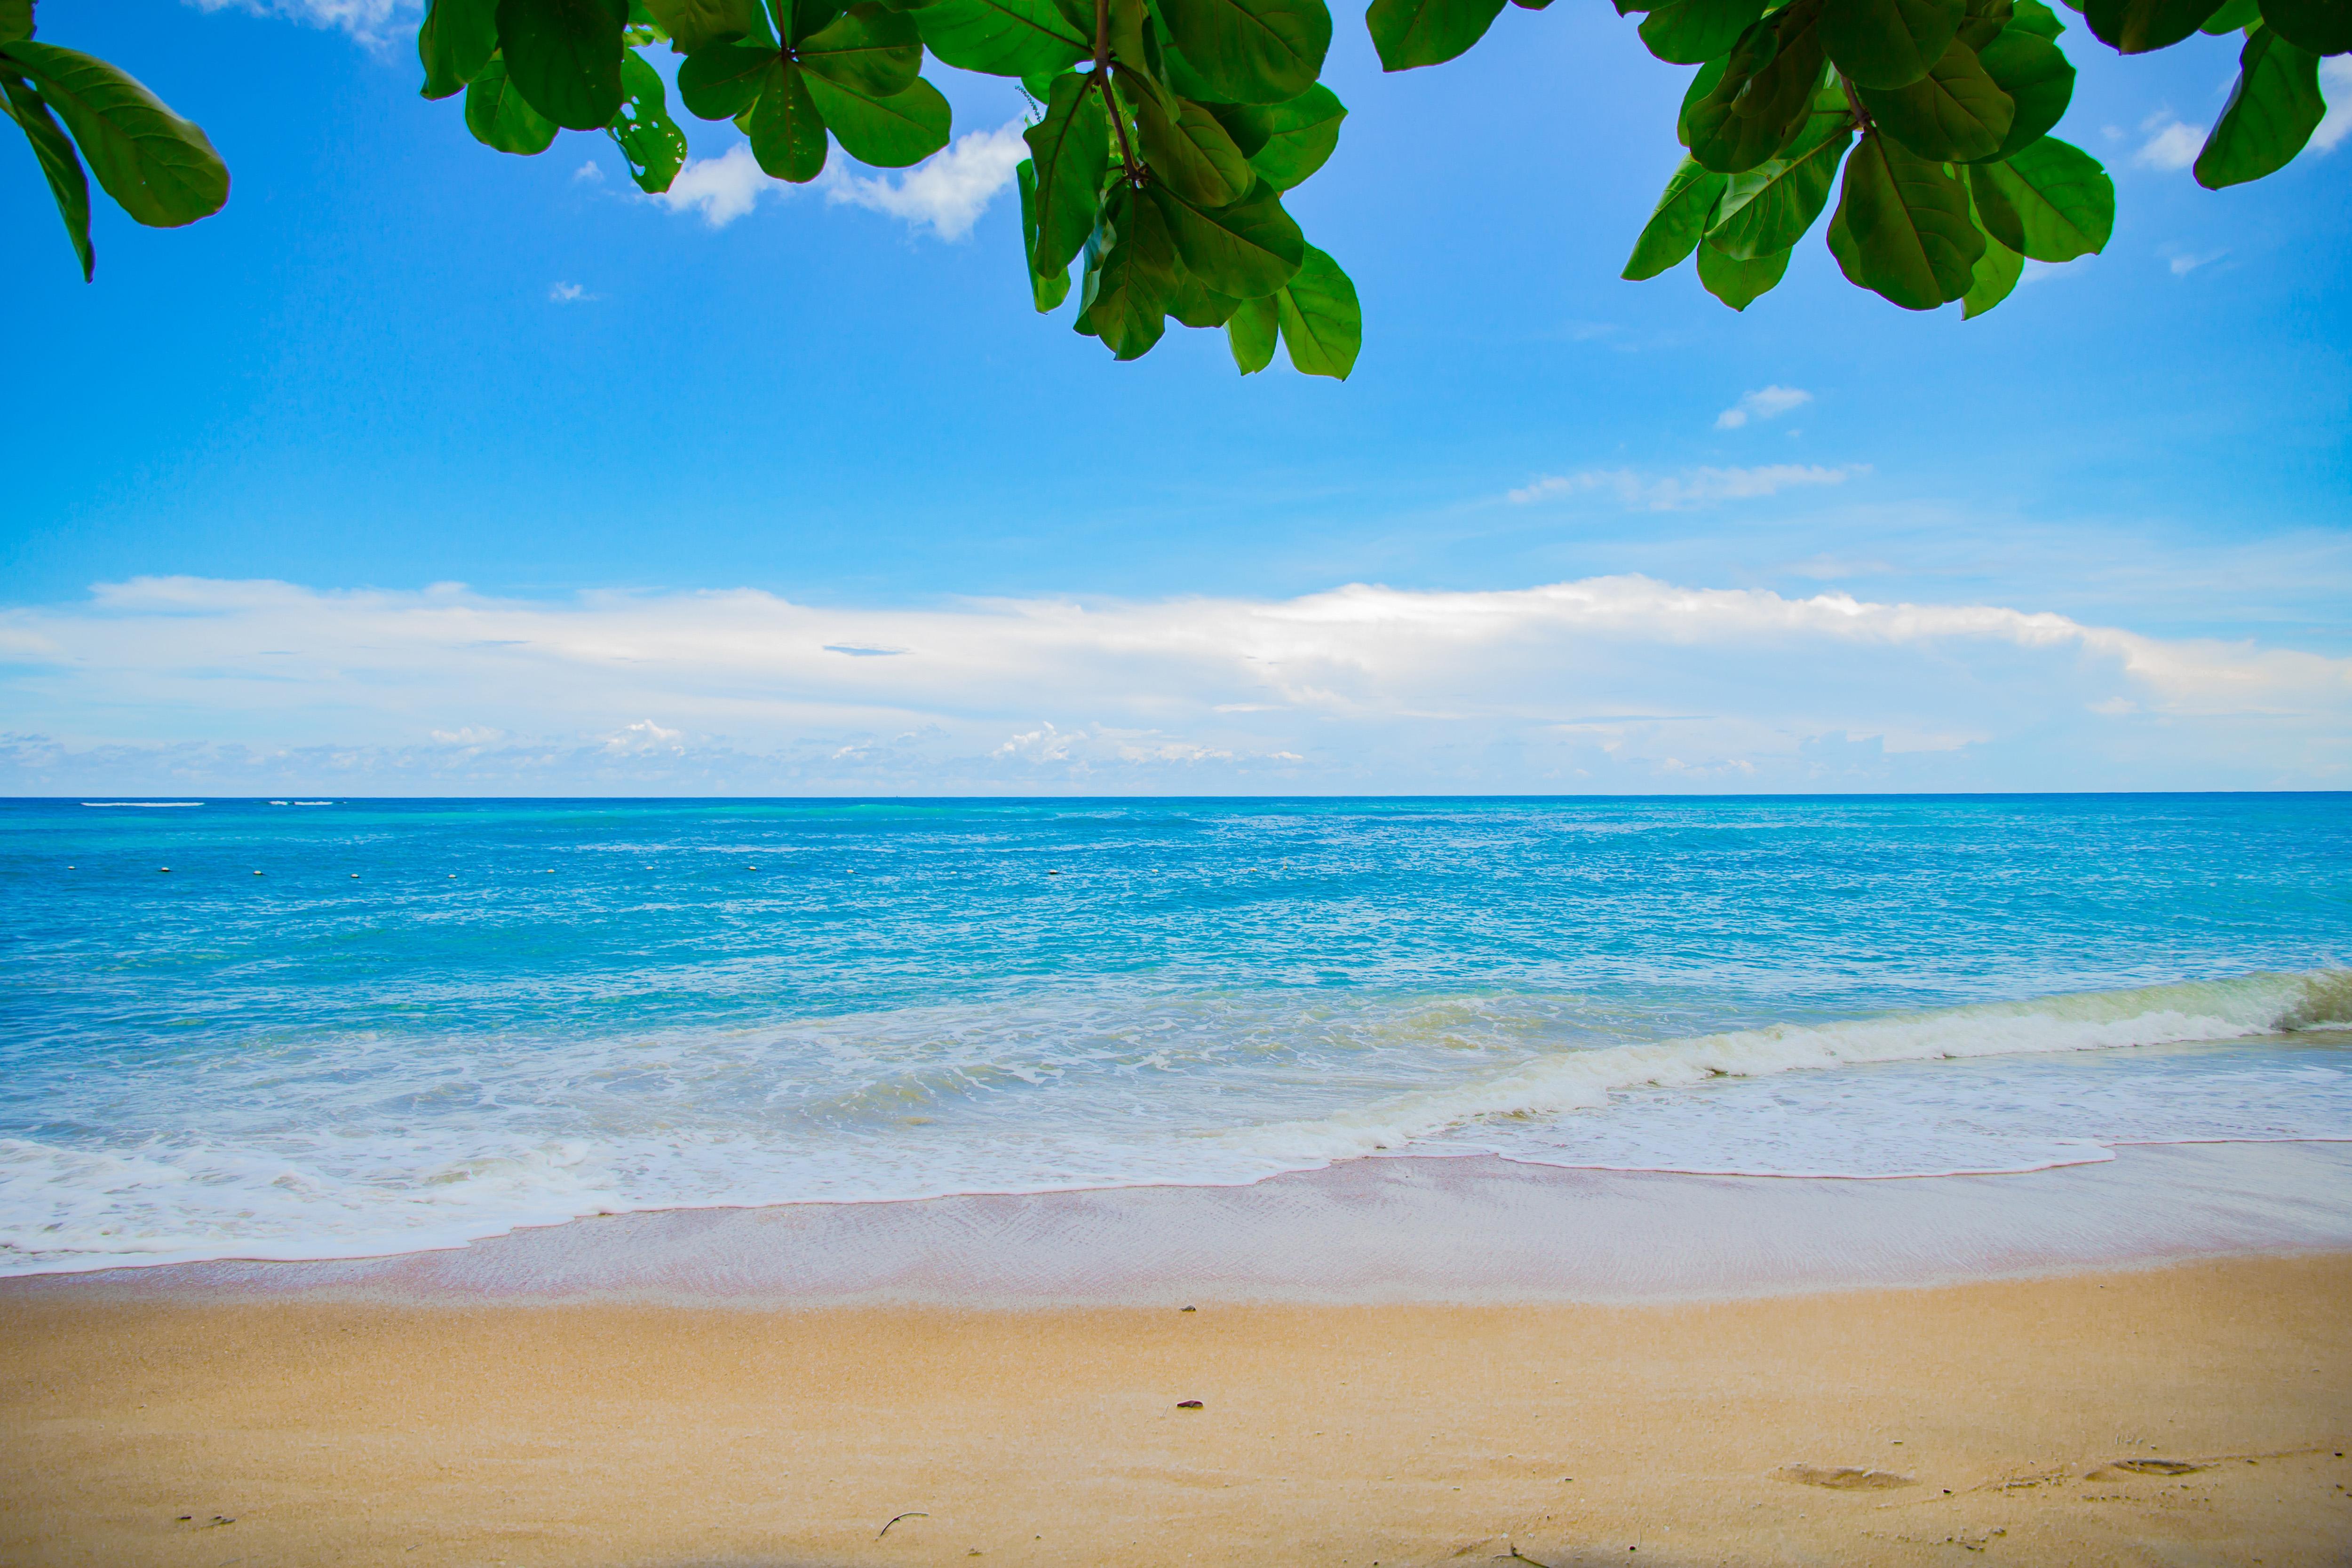 Summer Beach Free Photo - ISO Republic